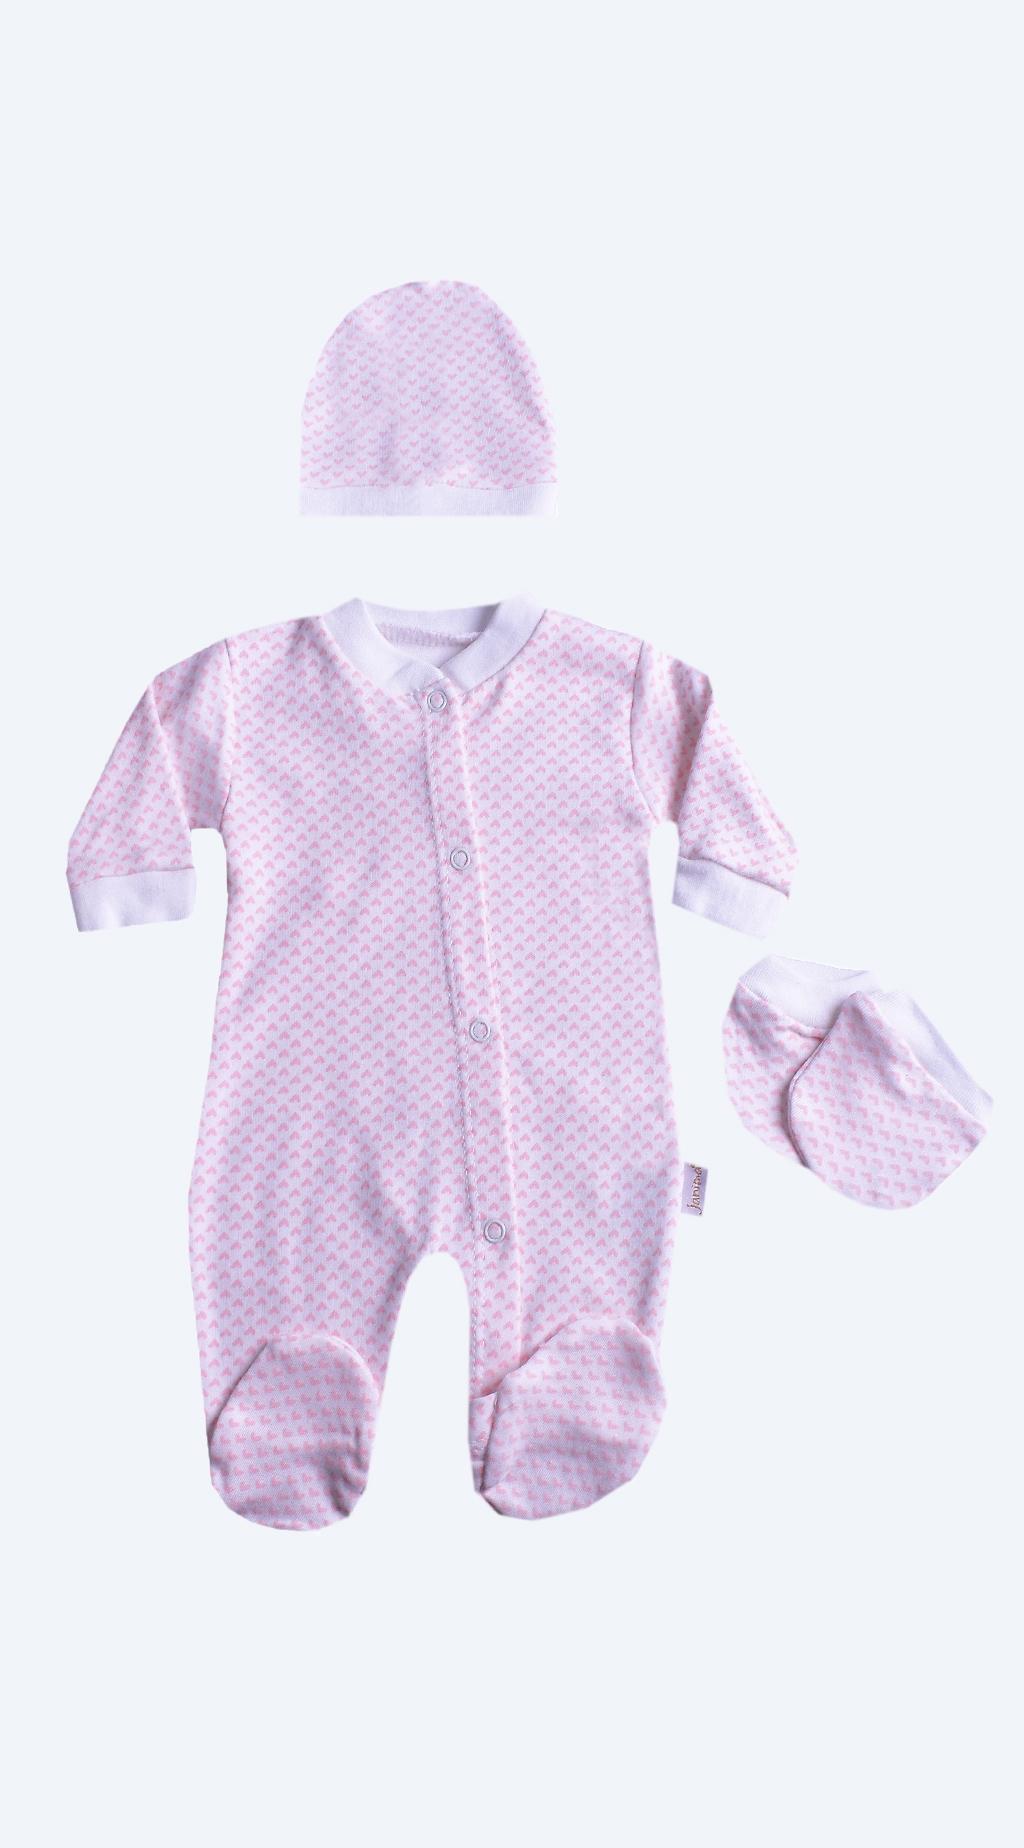 Long sleeve overalls for baby girl